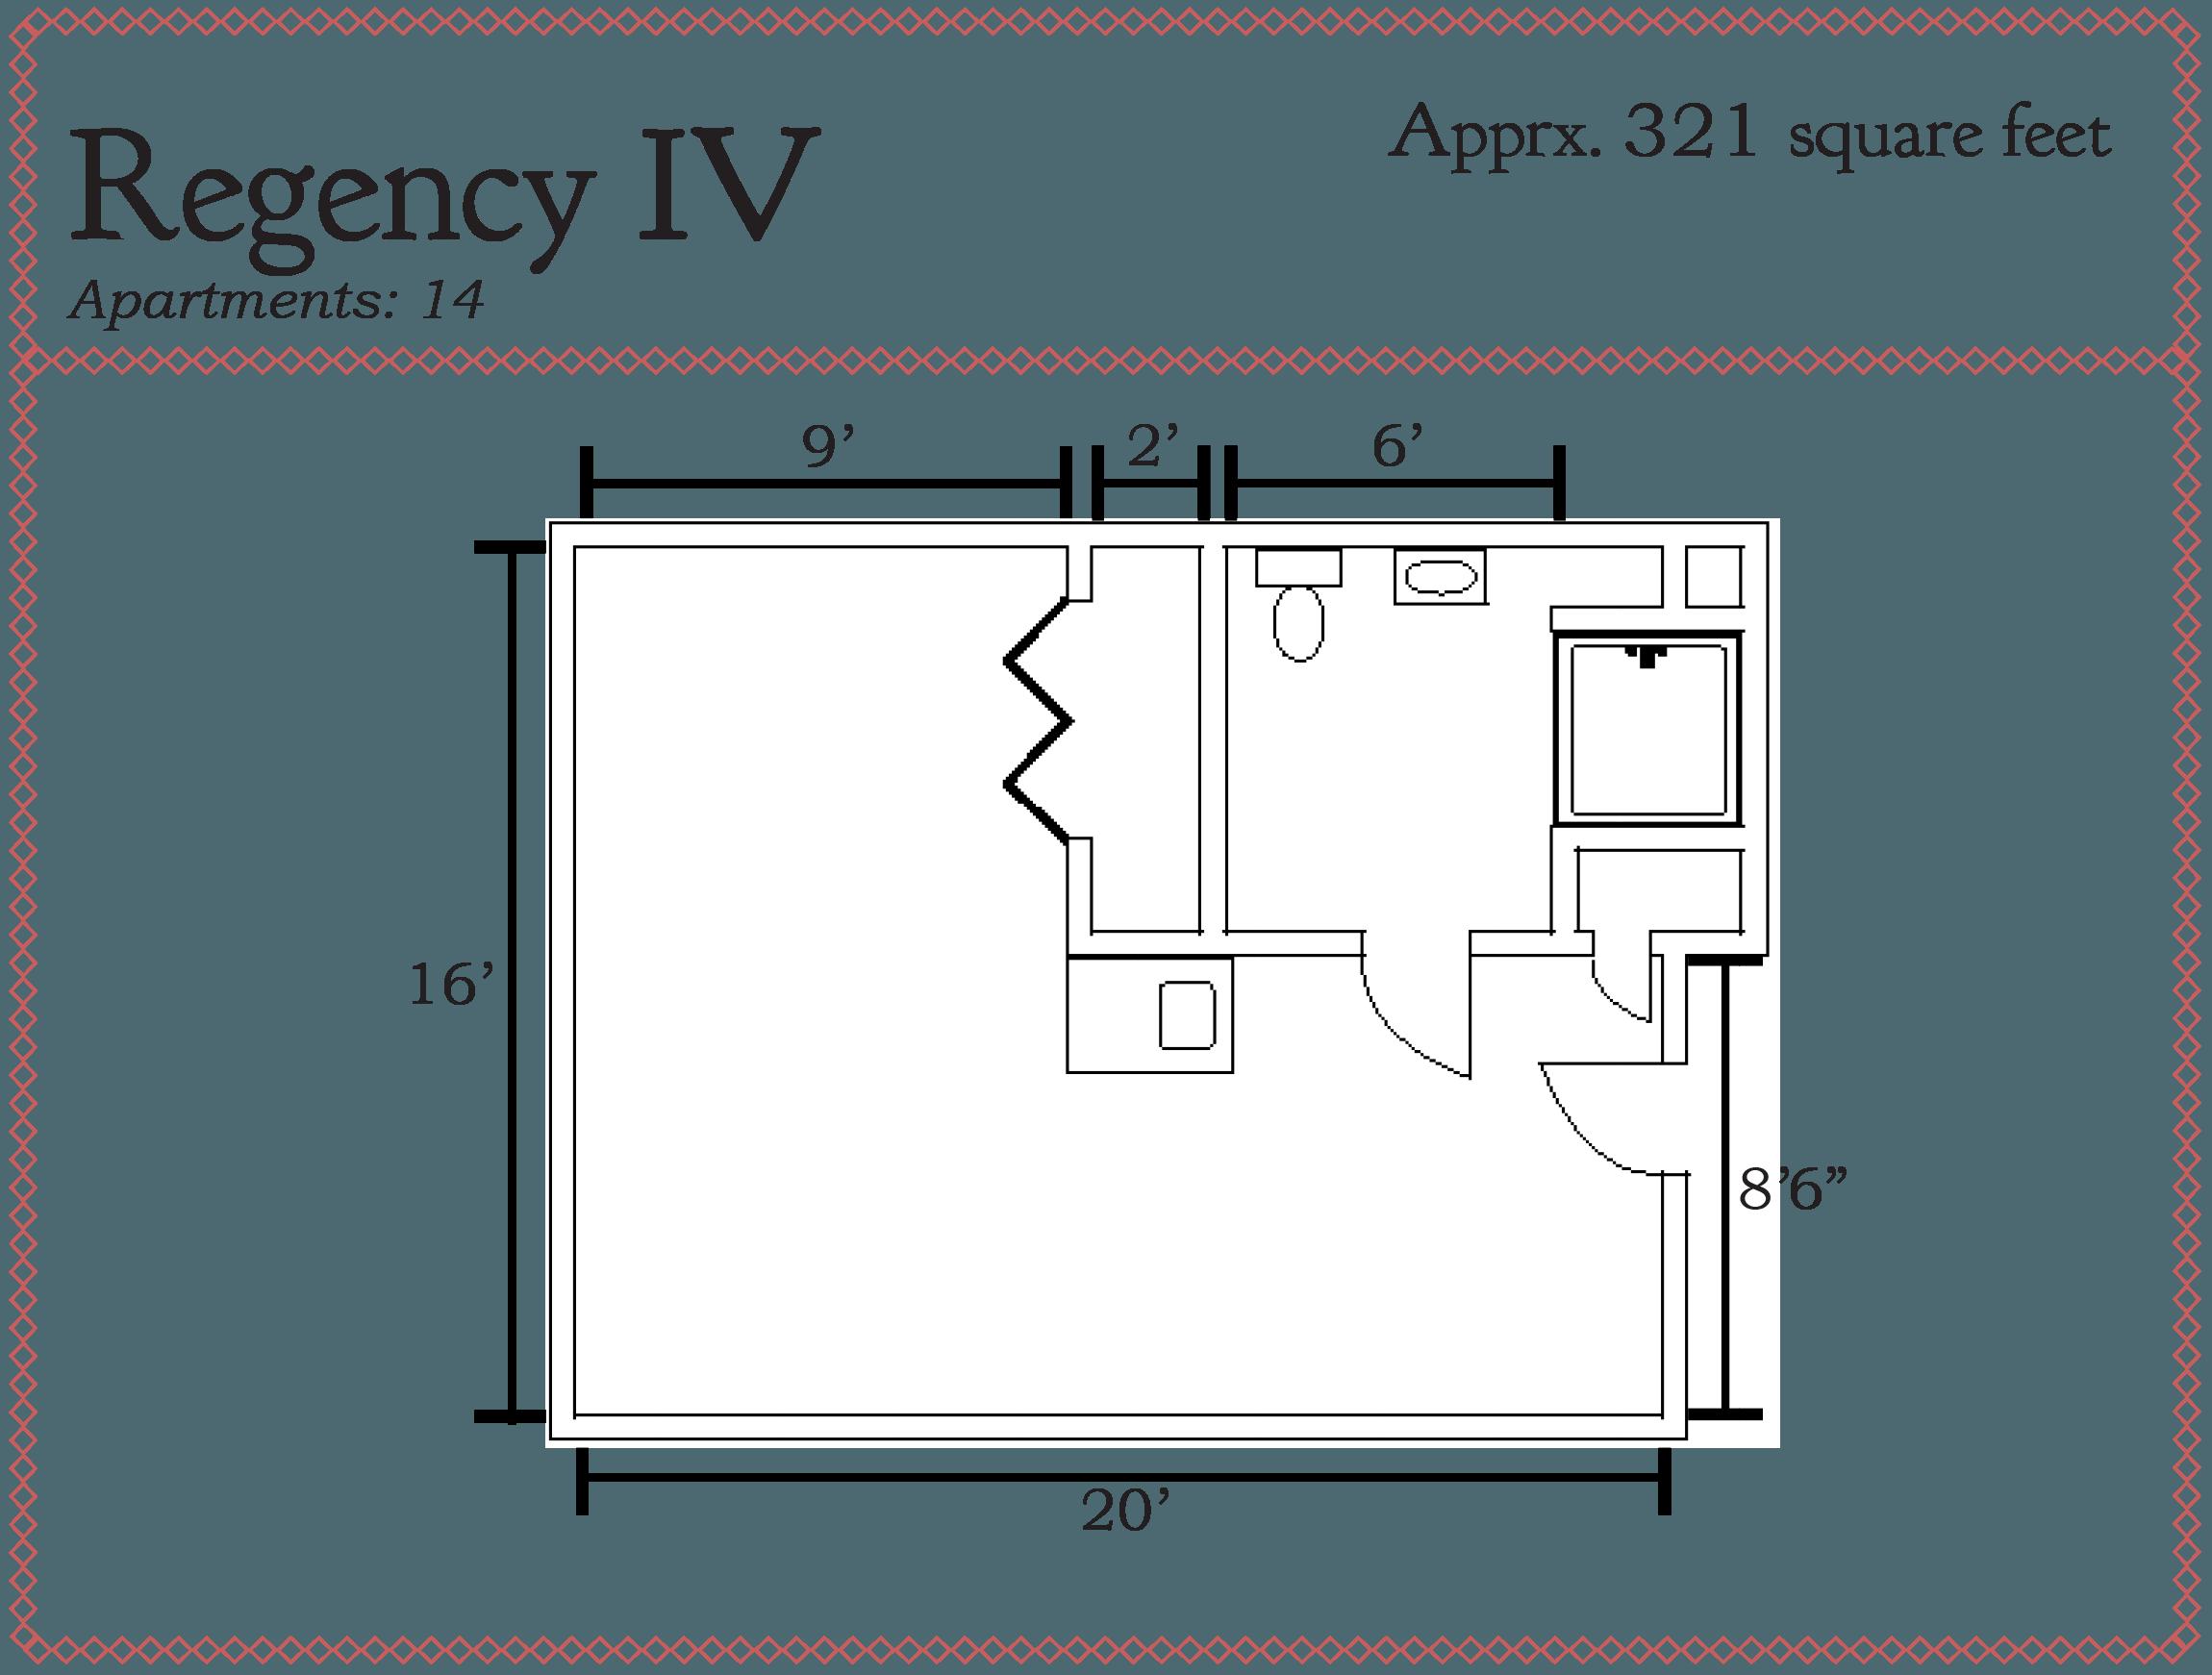 Regency IV